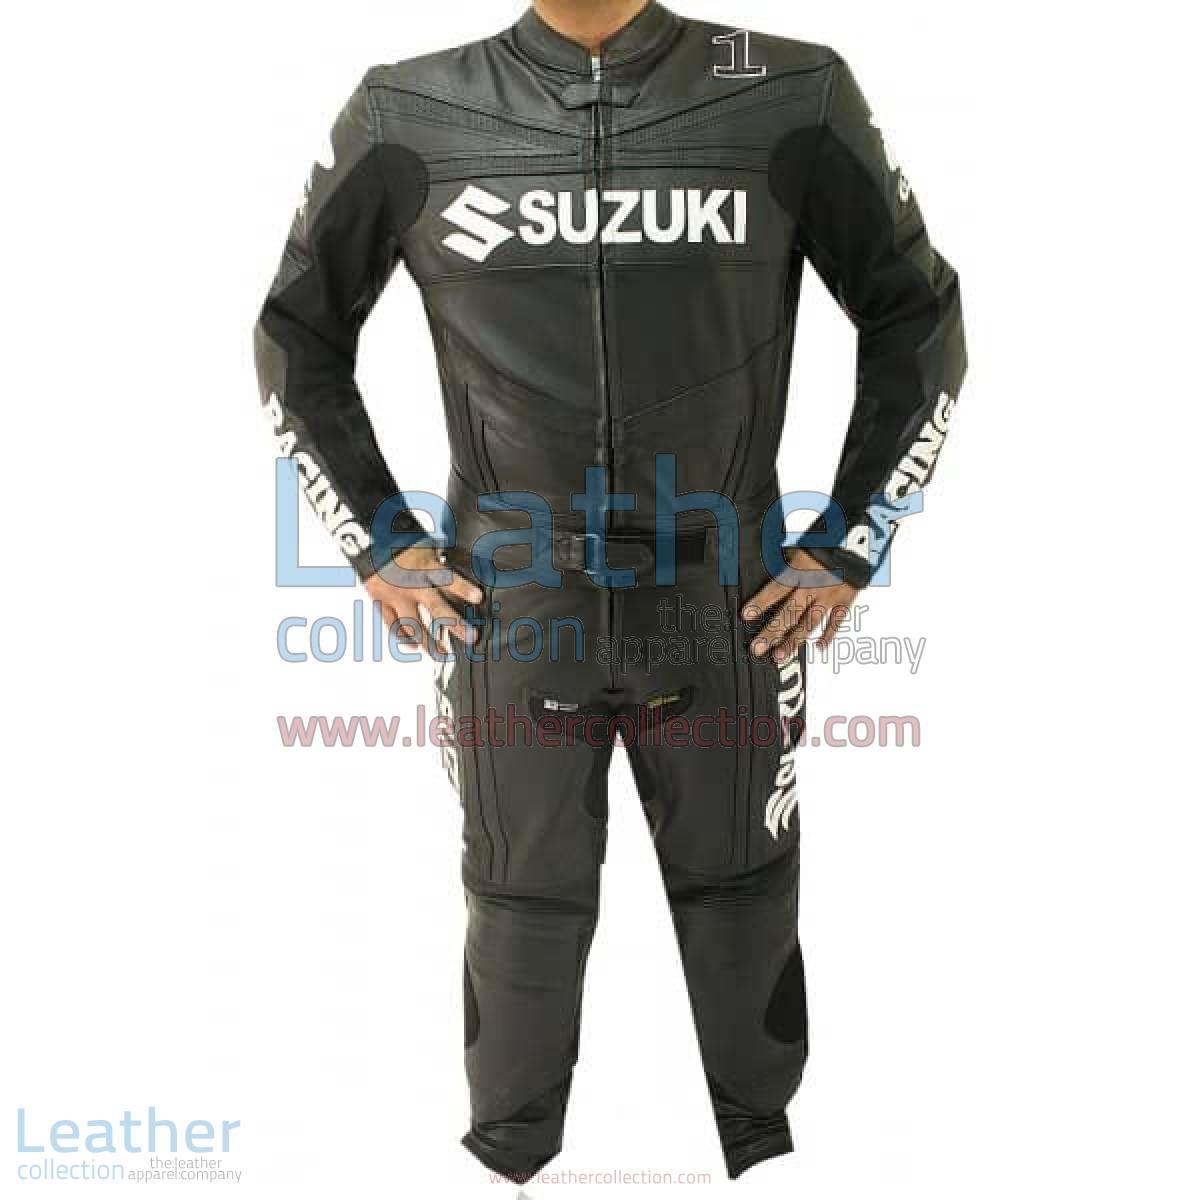 Suzuki Leather Racing Suit | suzuki racing